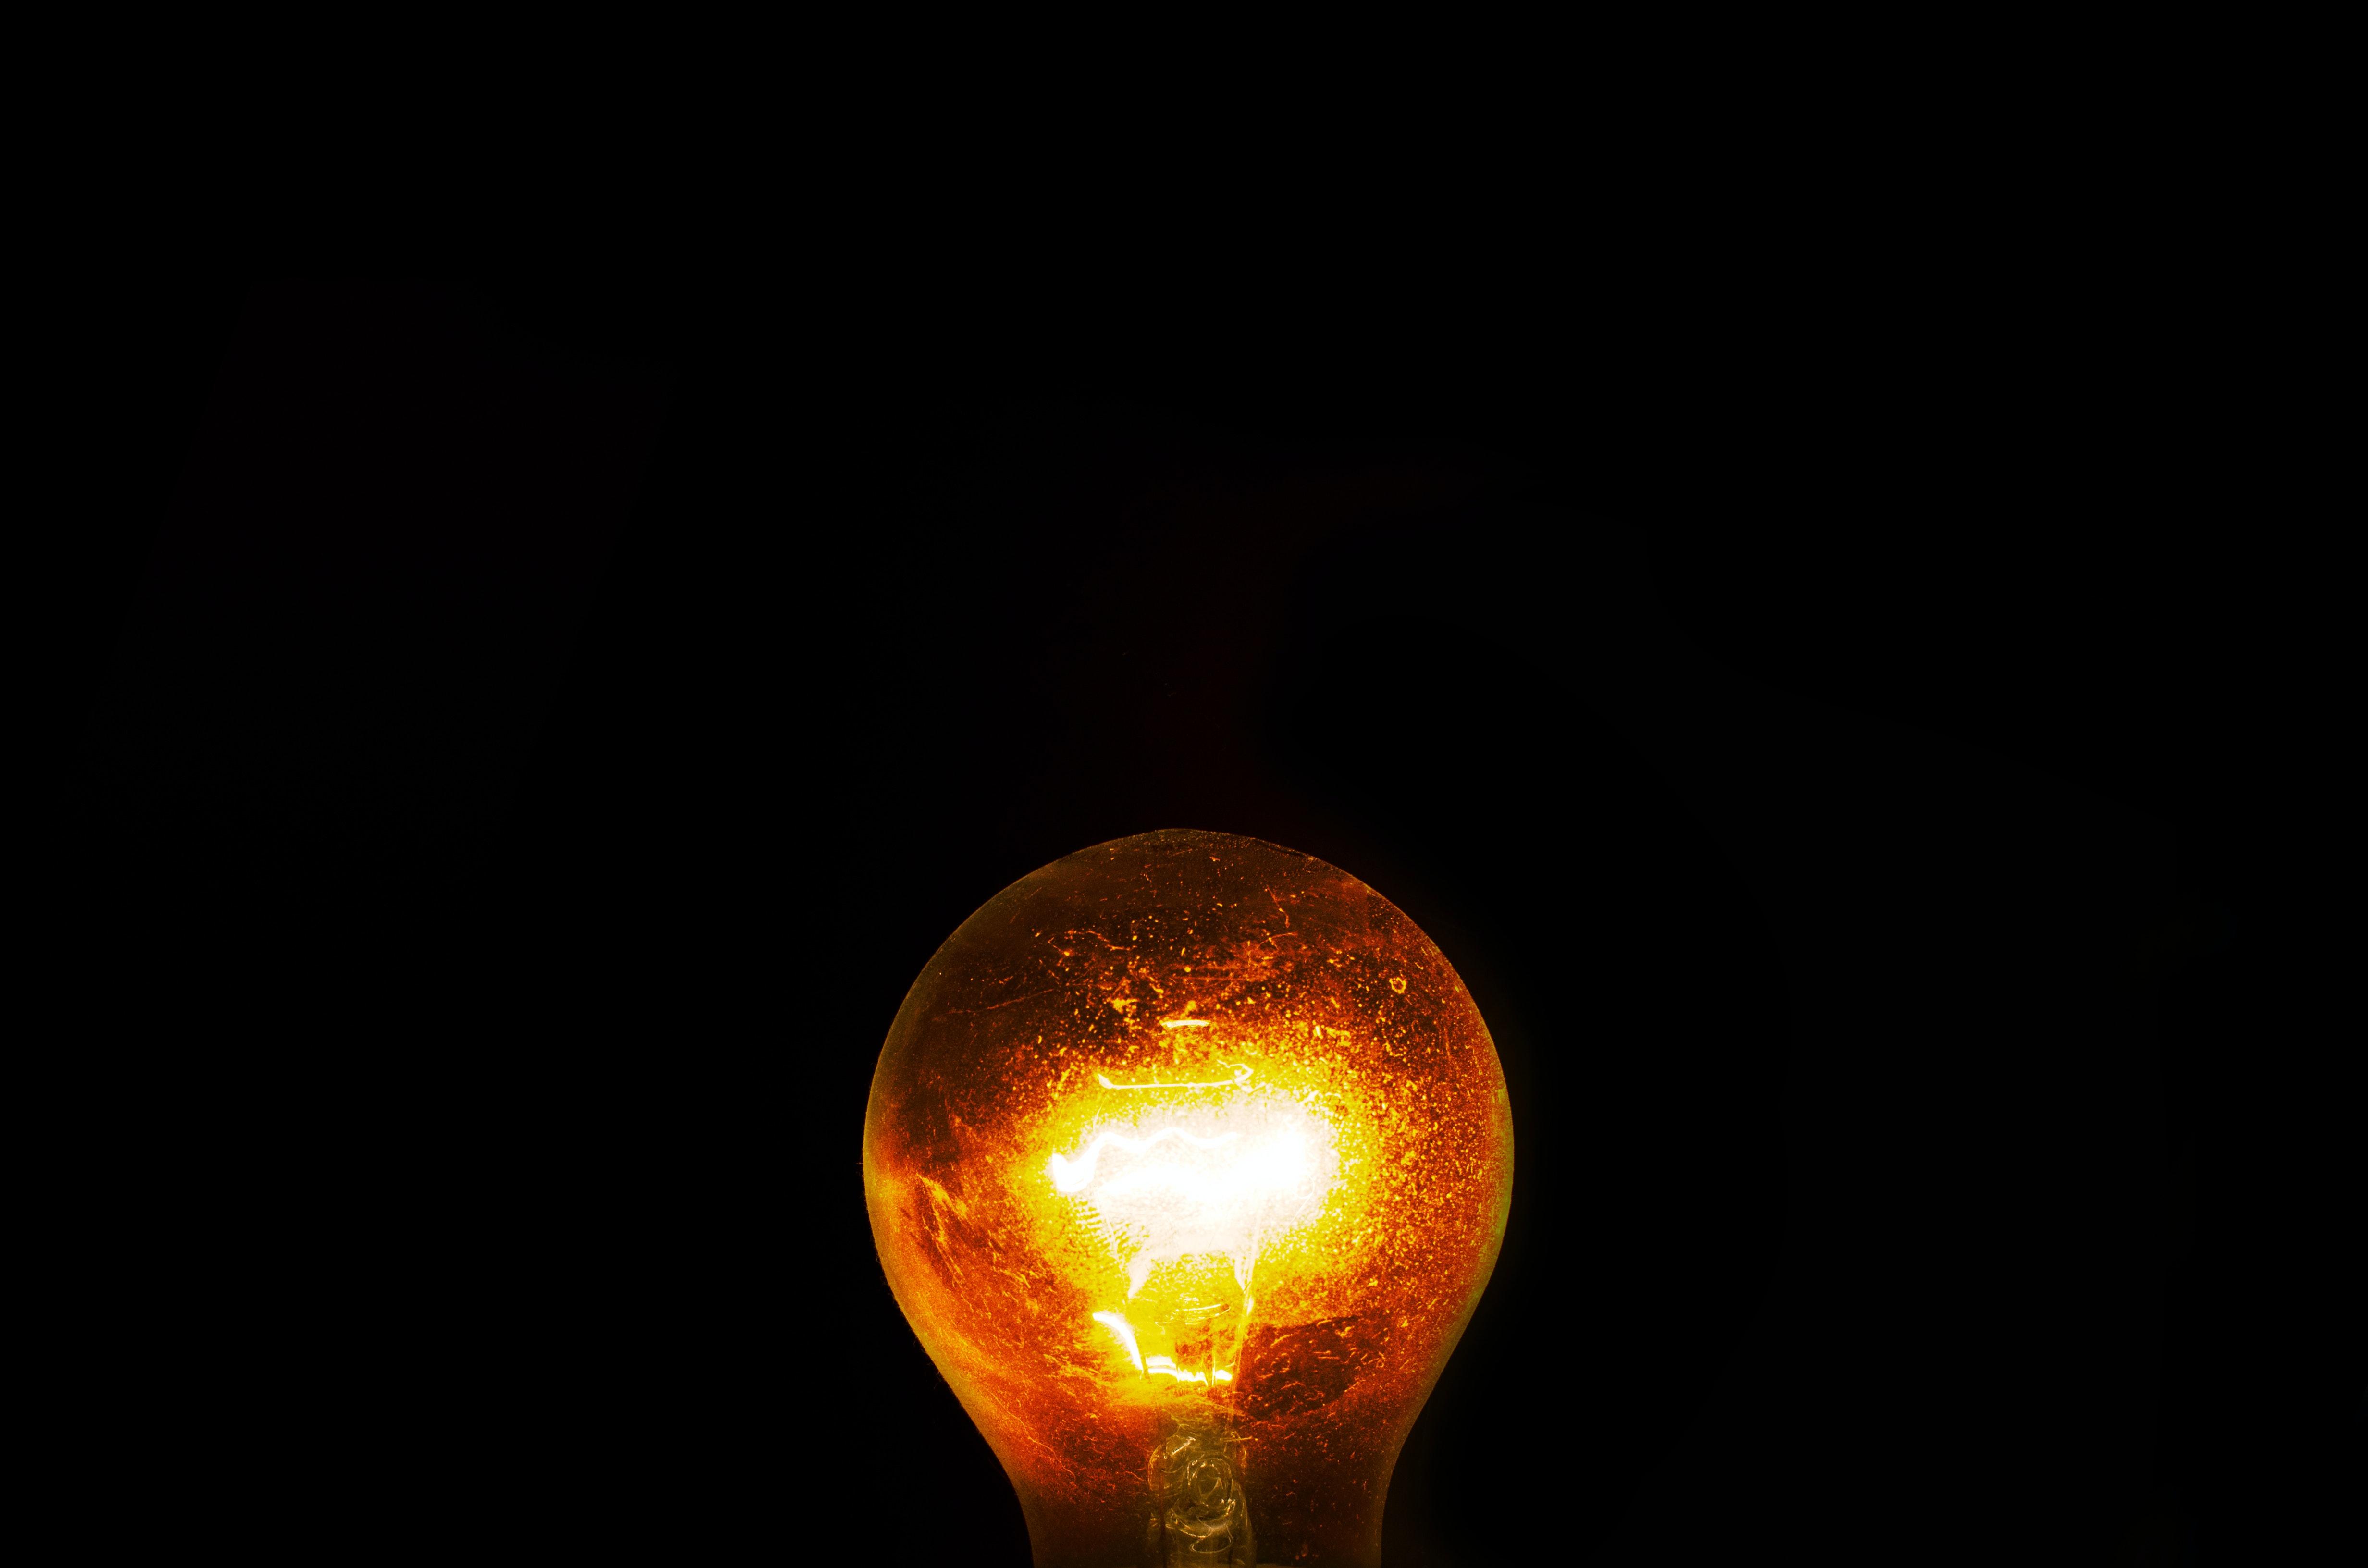 White Twist Light Bulb 183 Free Stock Photo